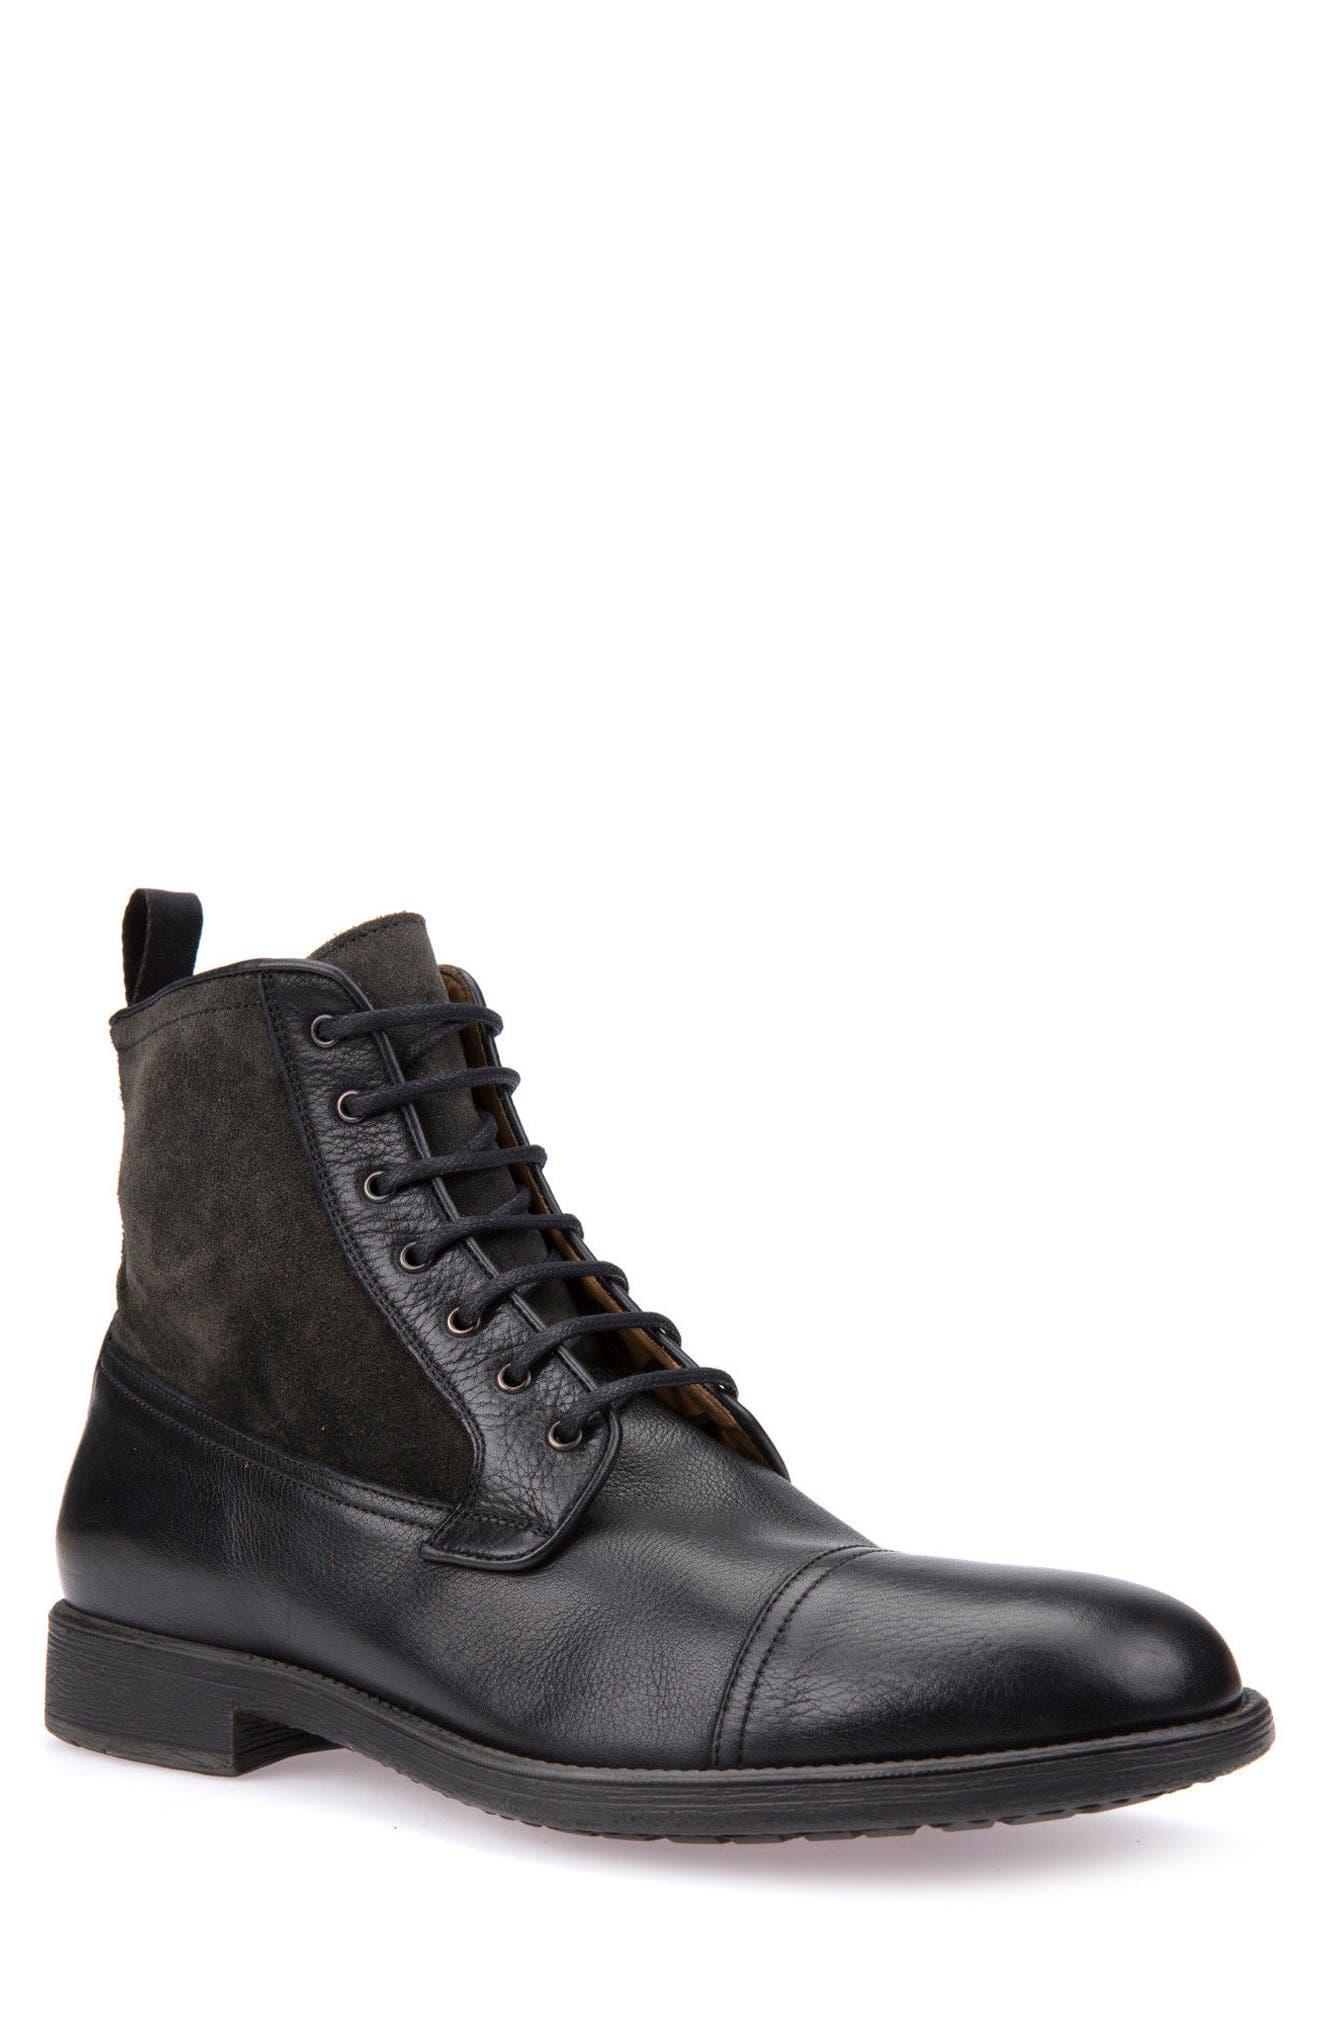 Jaylon 12 Cap-Toe Boot,                             Main thumbnail 1, color,                             001